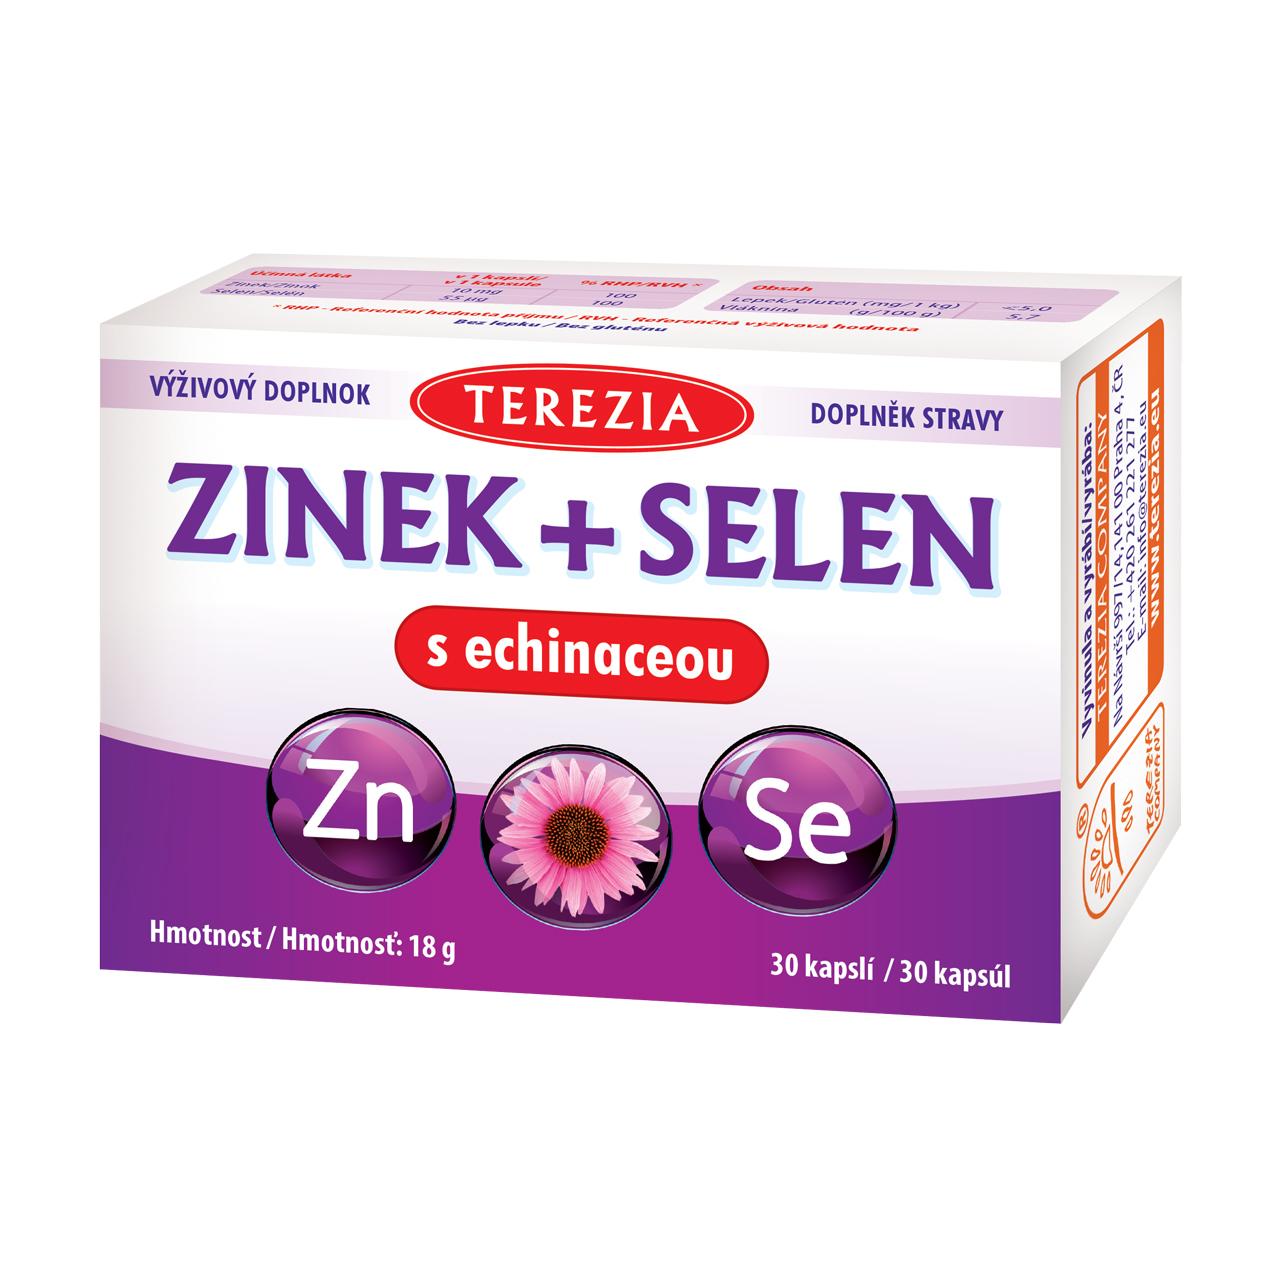 Levně Zinek + selen s echinaceou